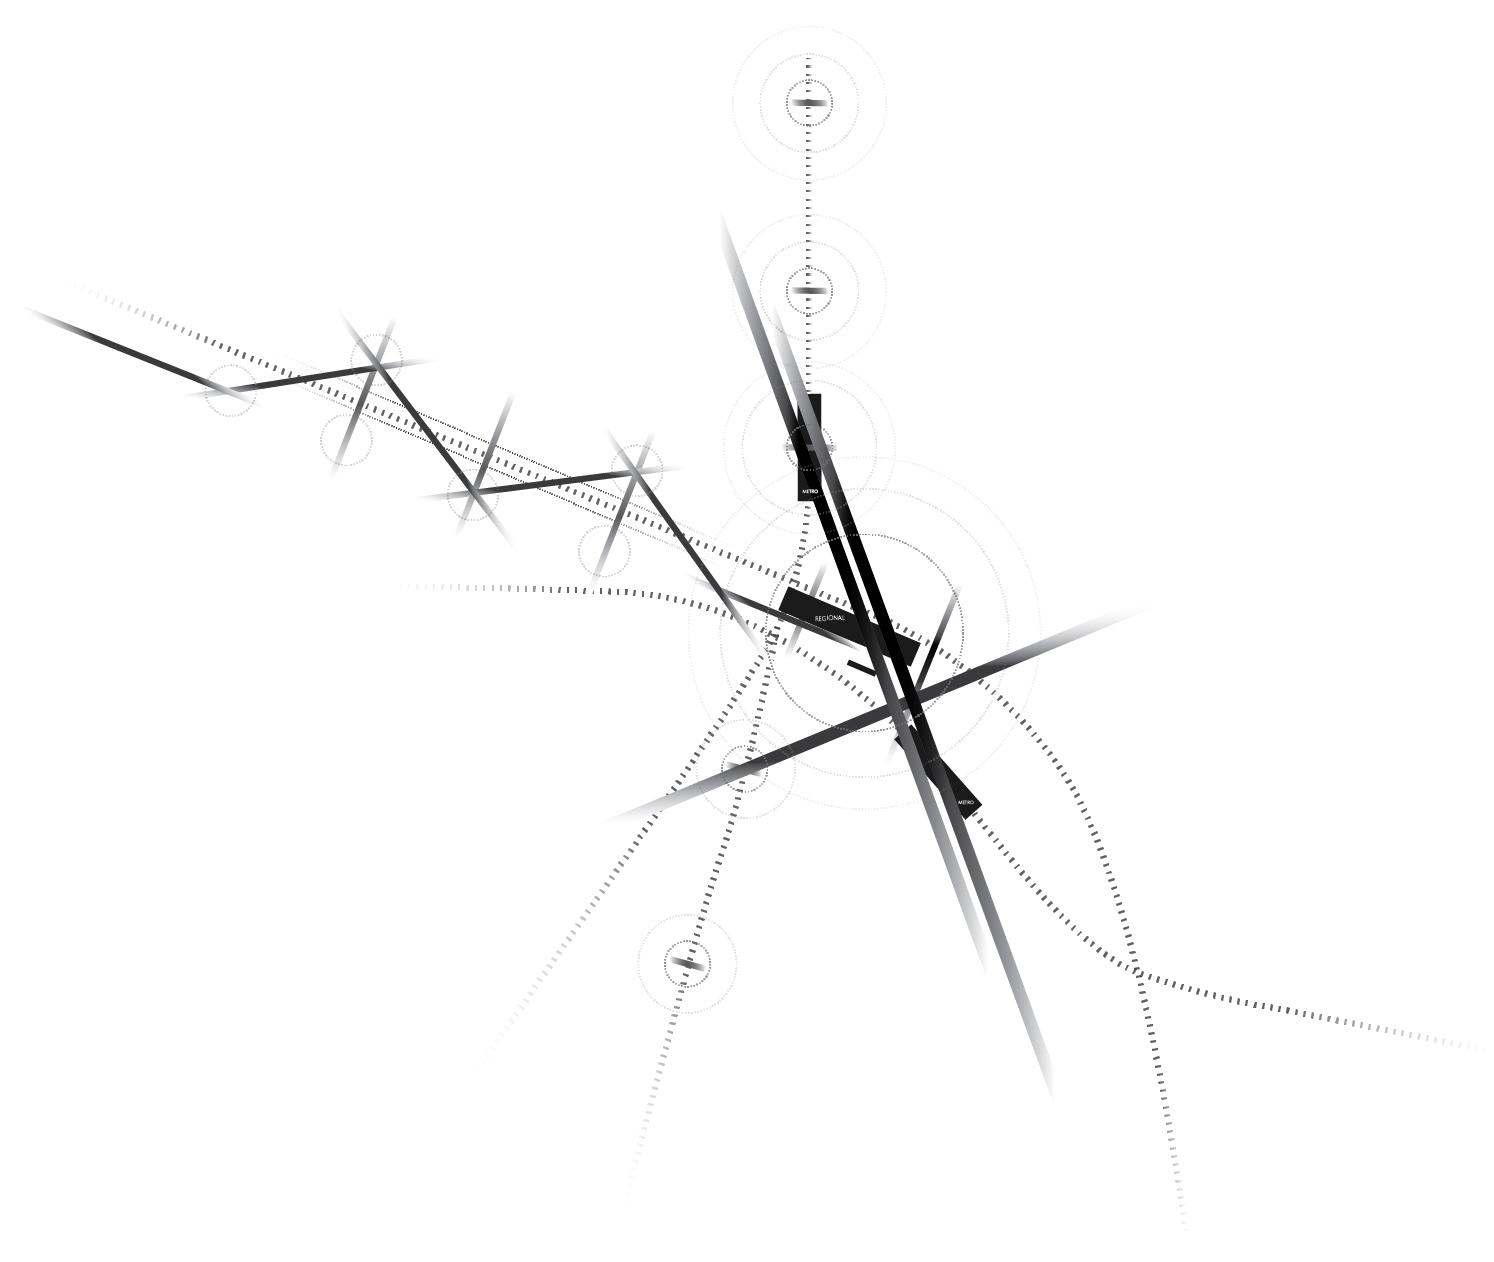 SHEA_Diagram.jpg